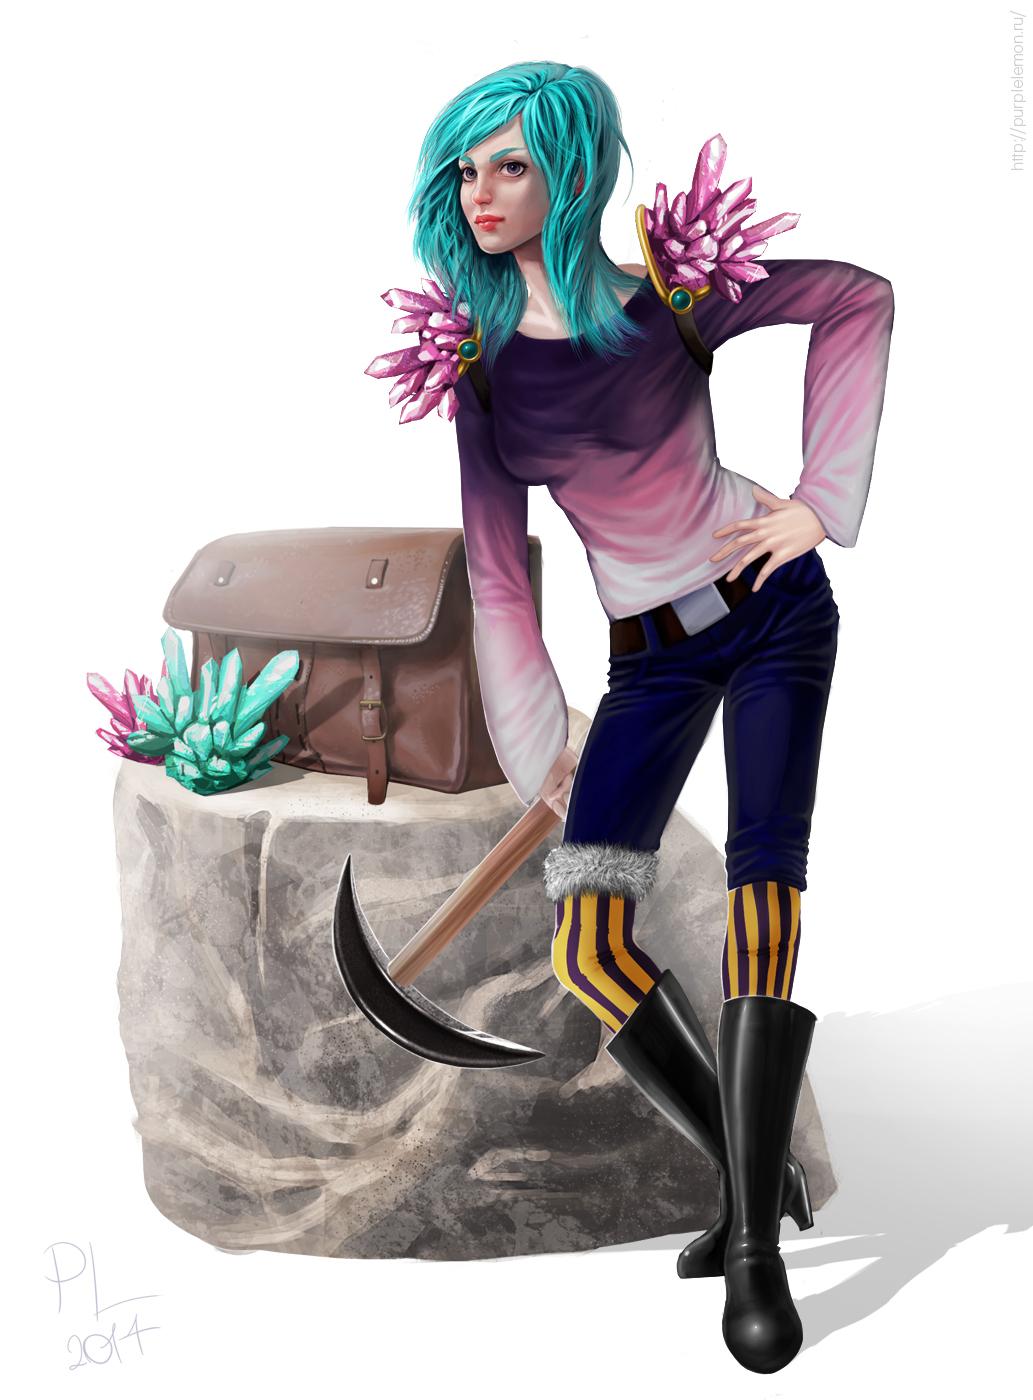 Miner by PurpleLemon13